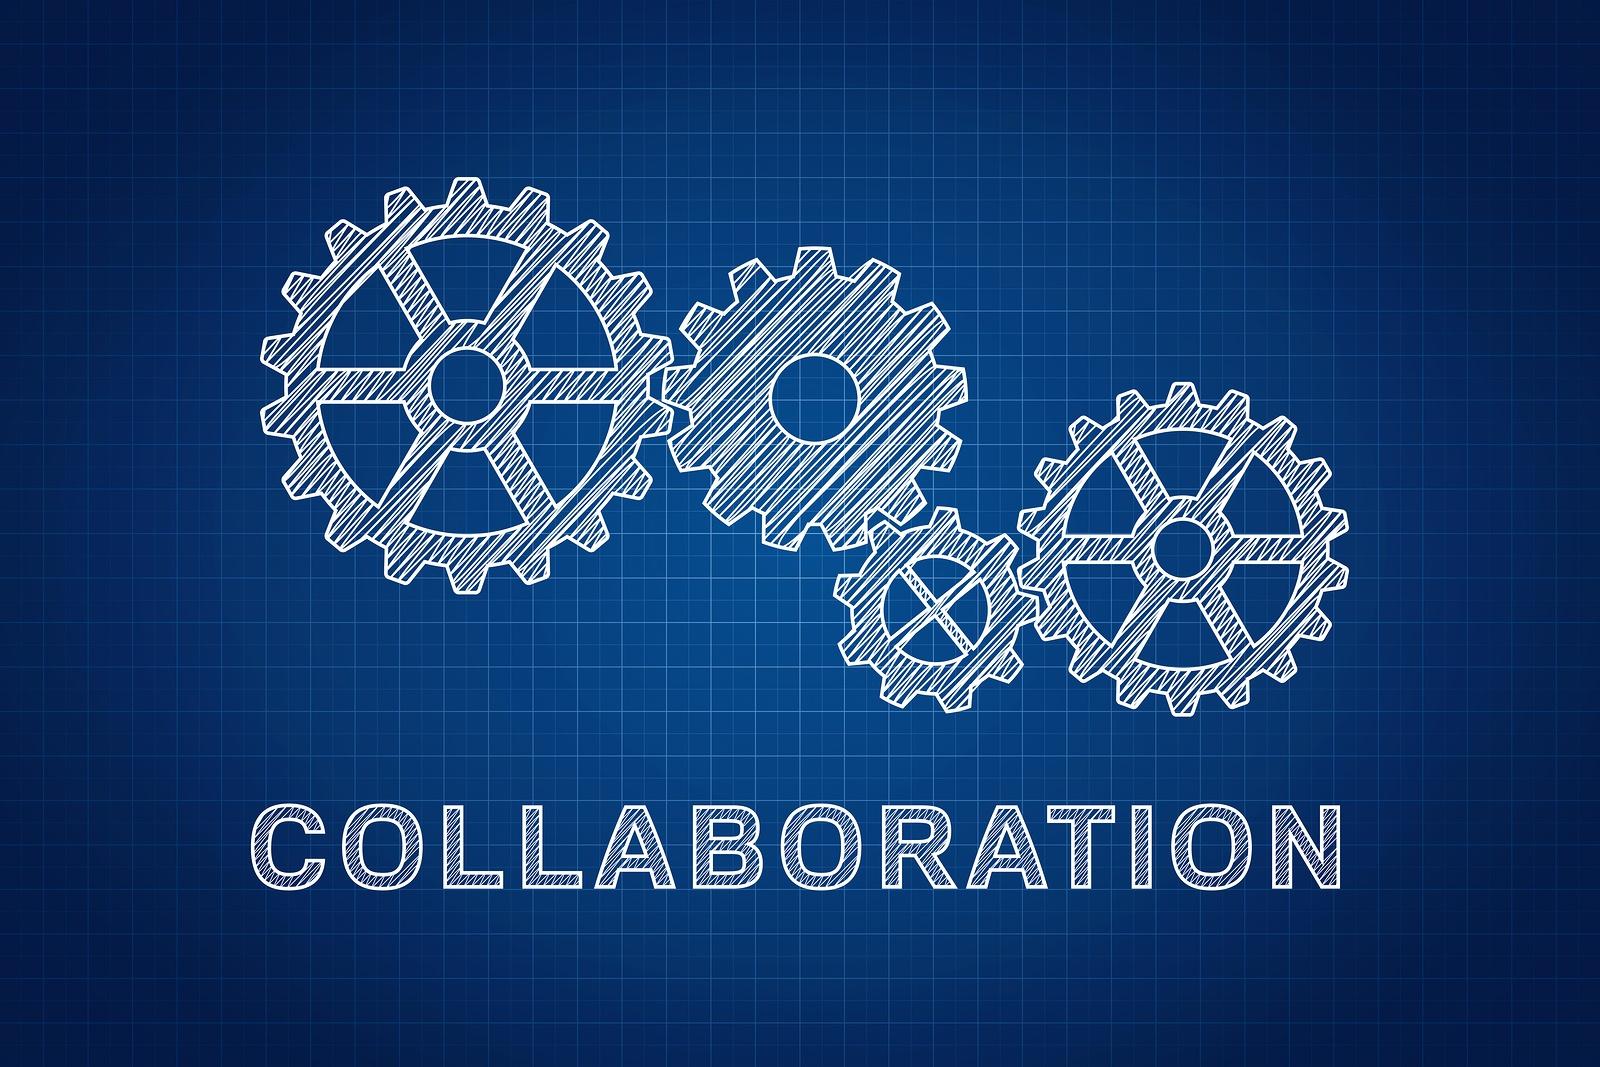 bigstock-Collaboration-Concept-Technic-58501853.jpg